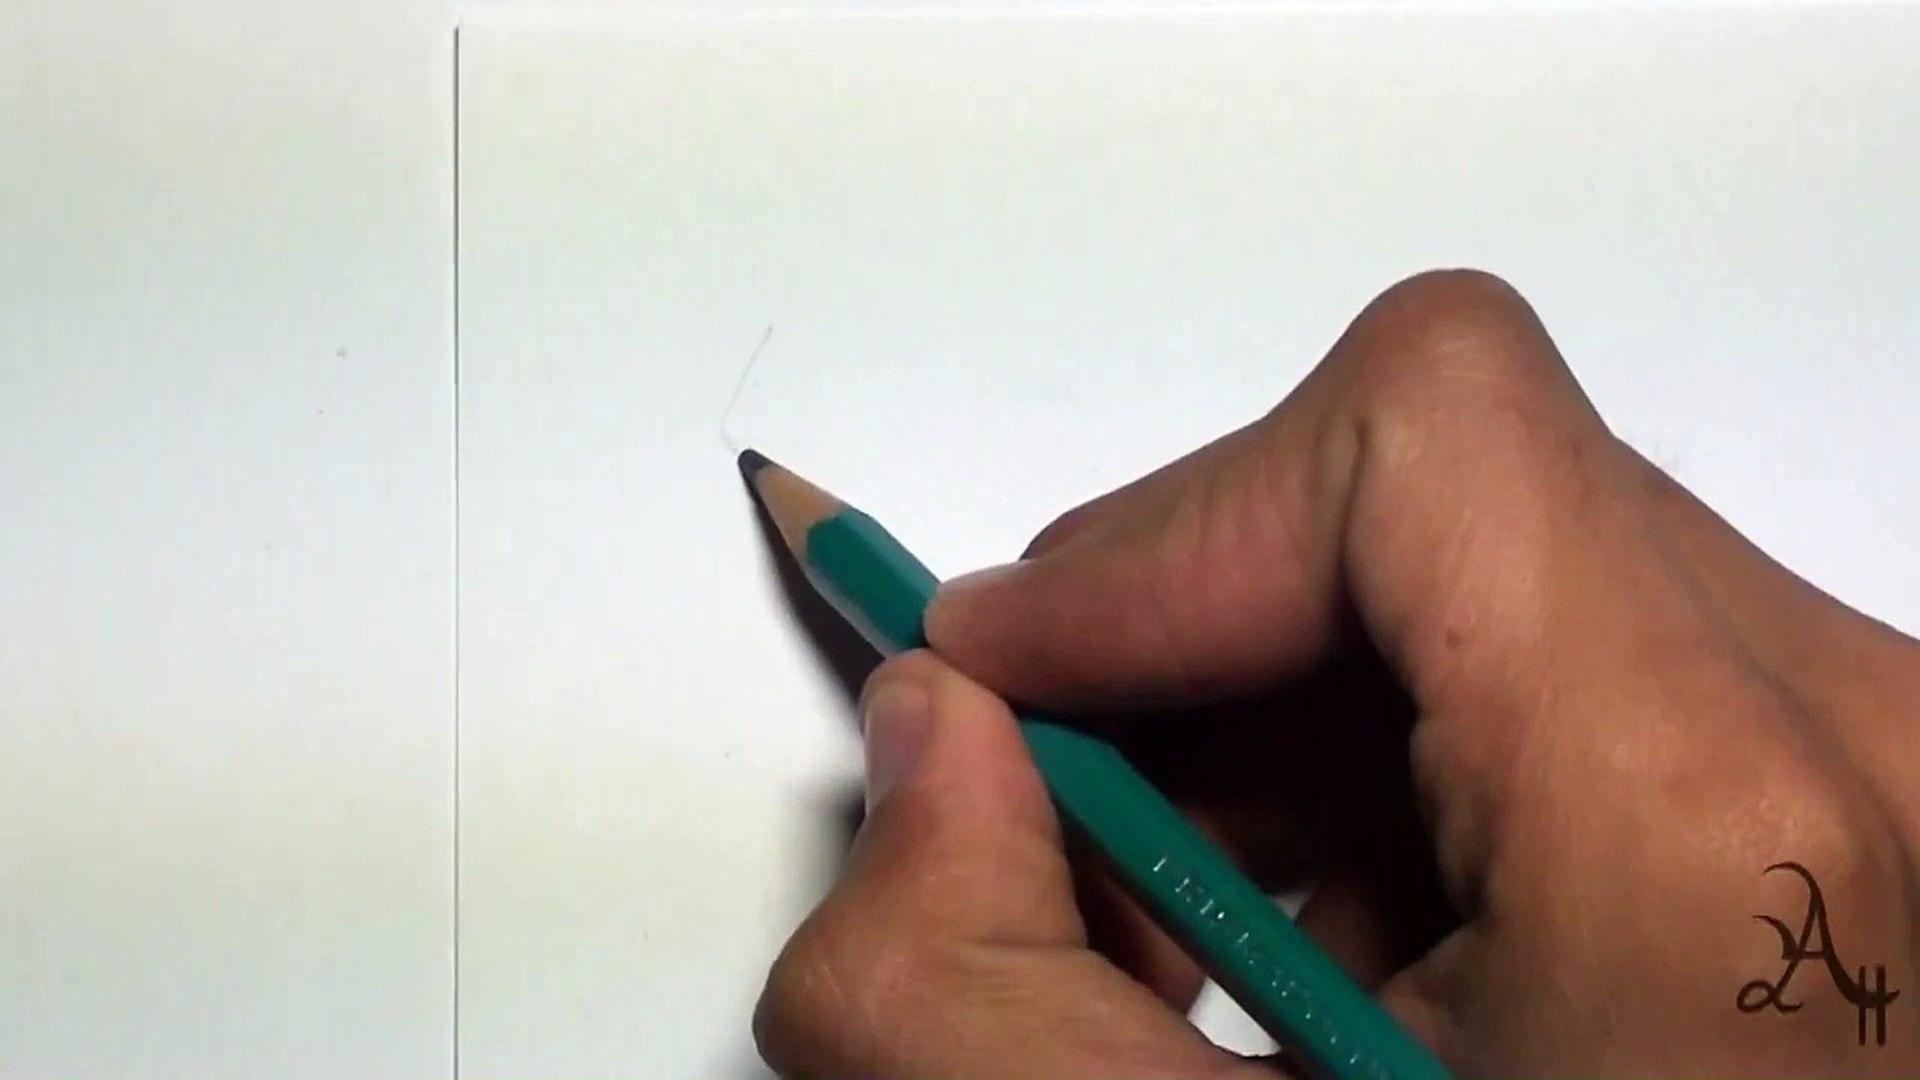 Como dibujar un ojo 目 manga/anime How to draw manga/anime eye 目 ░ ANIMADOSDANN anime 18